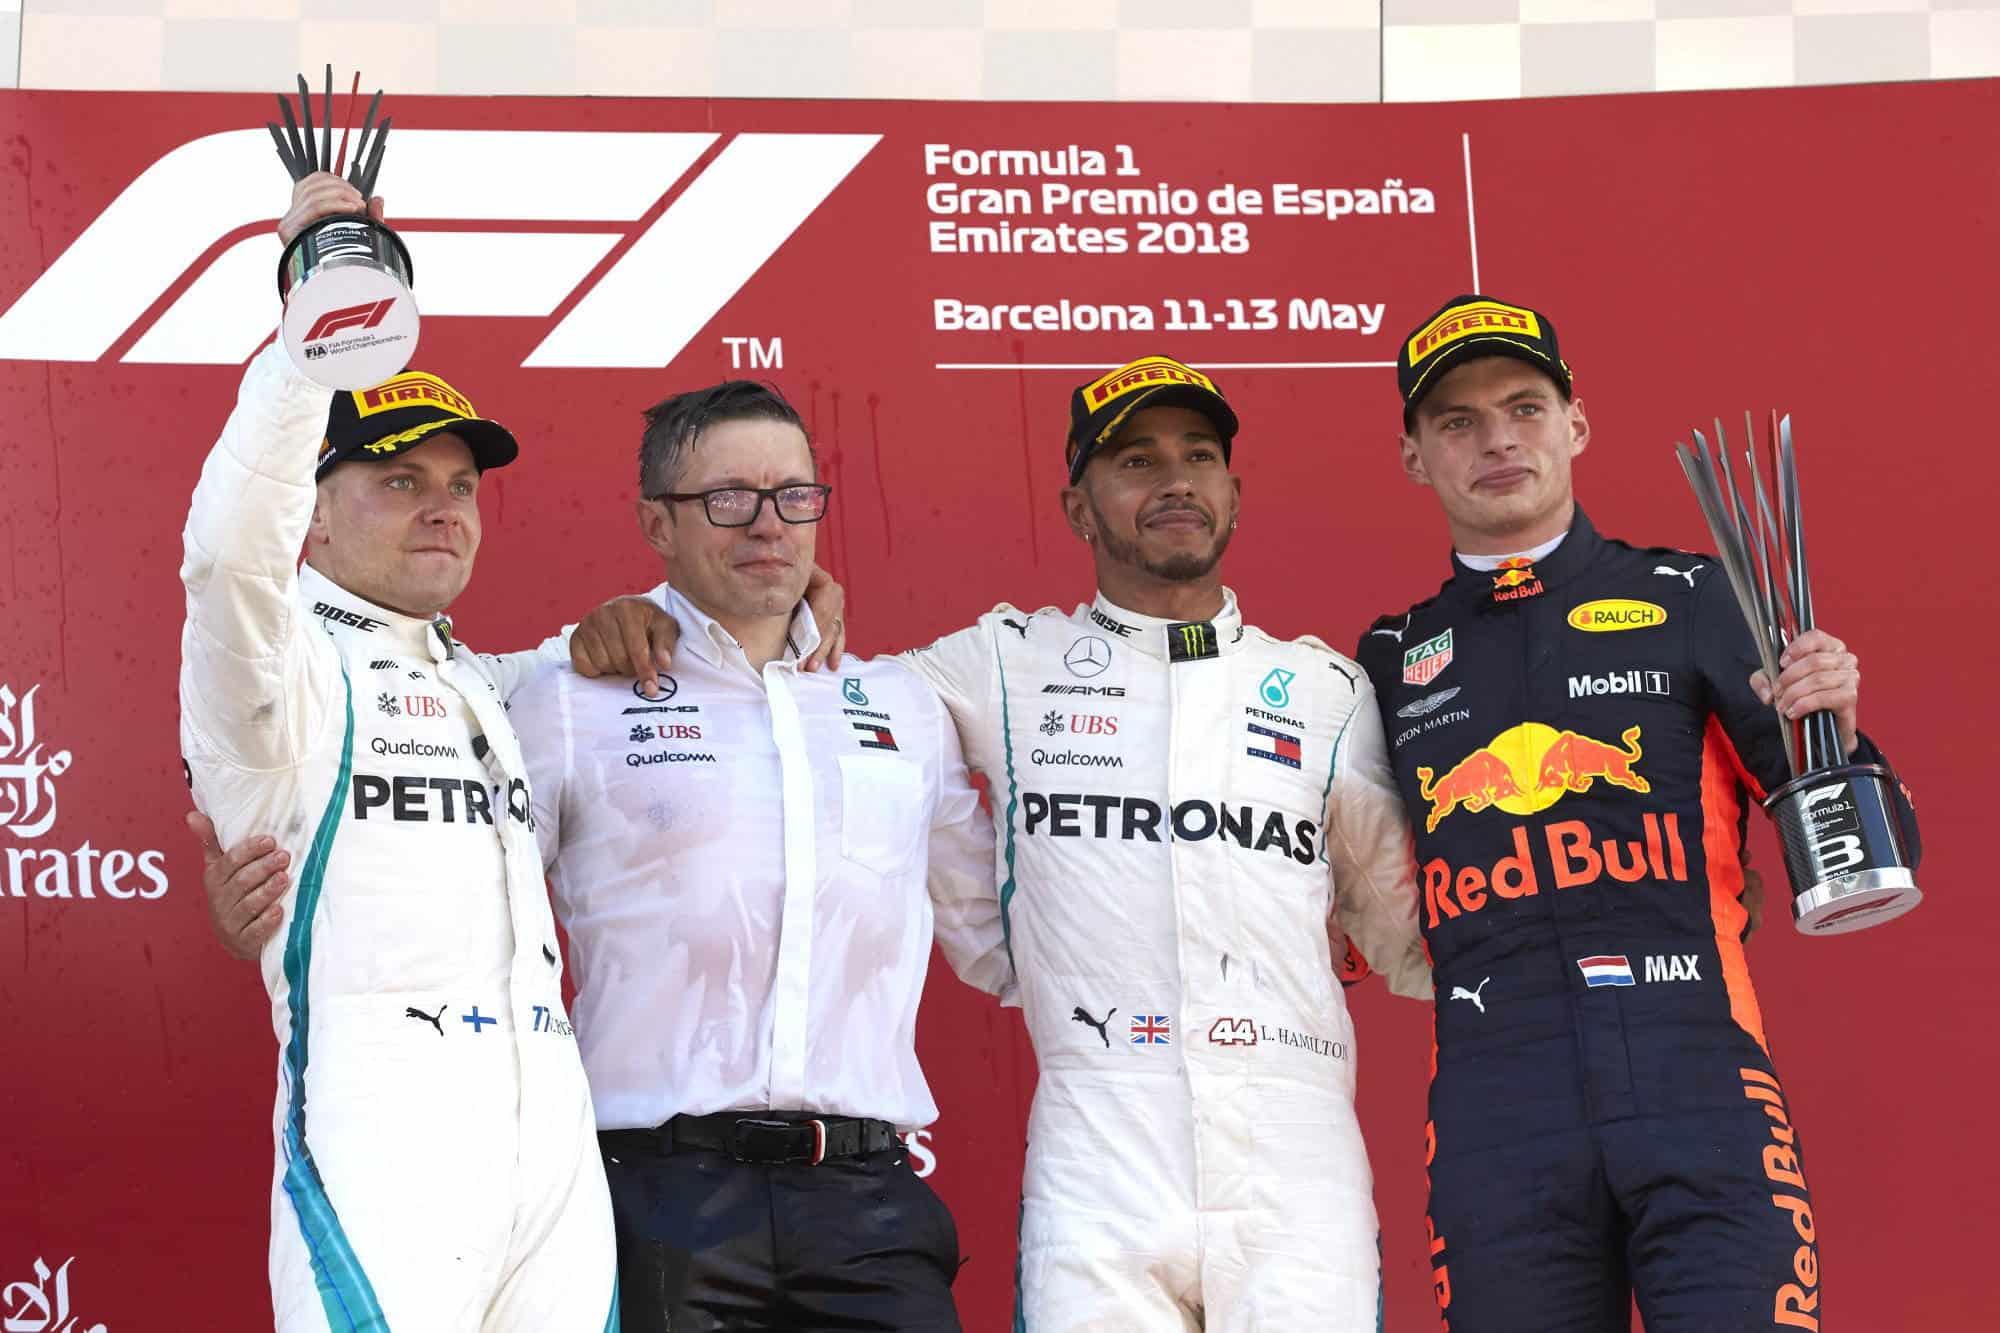 2018 Spanish GP Podium Hamilton Bottas Verstappen Photo Daimler